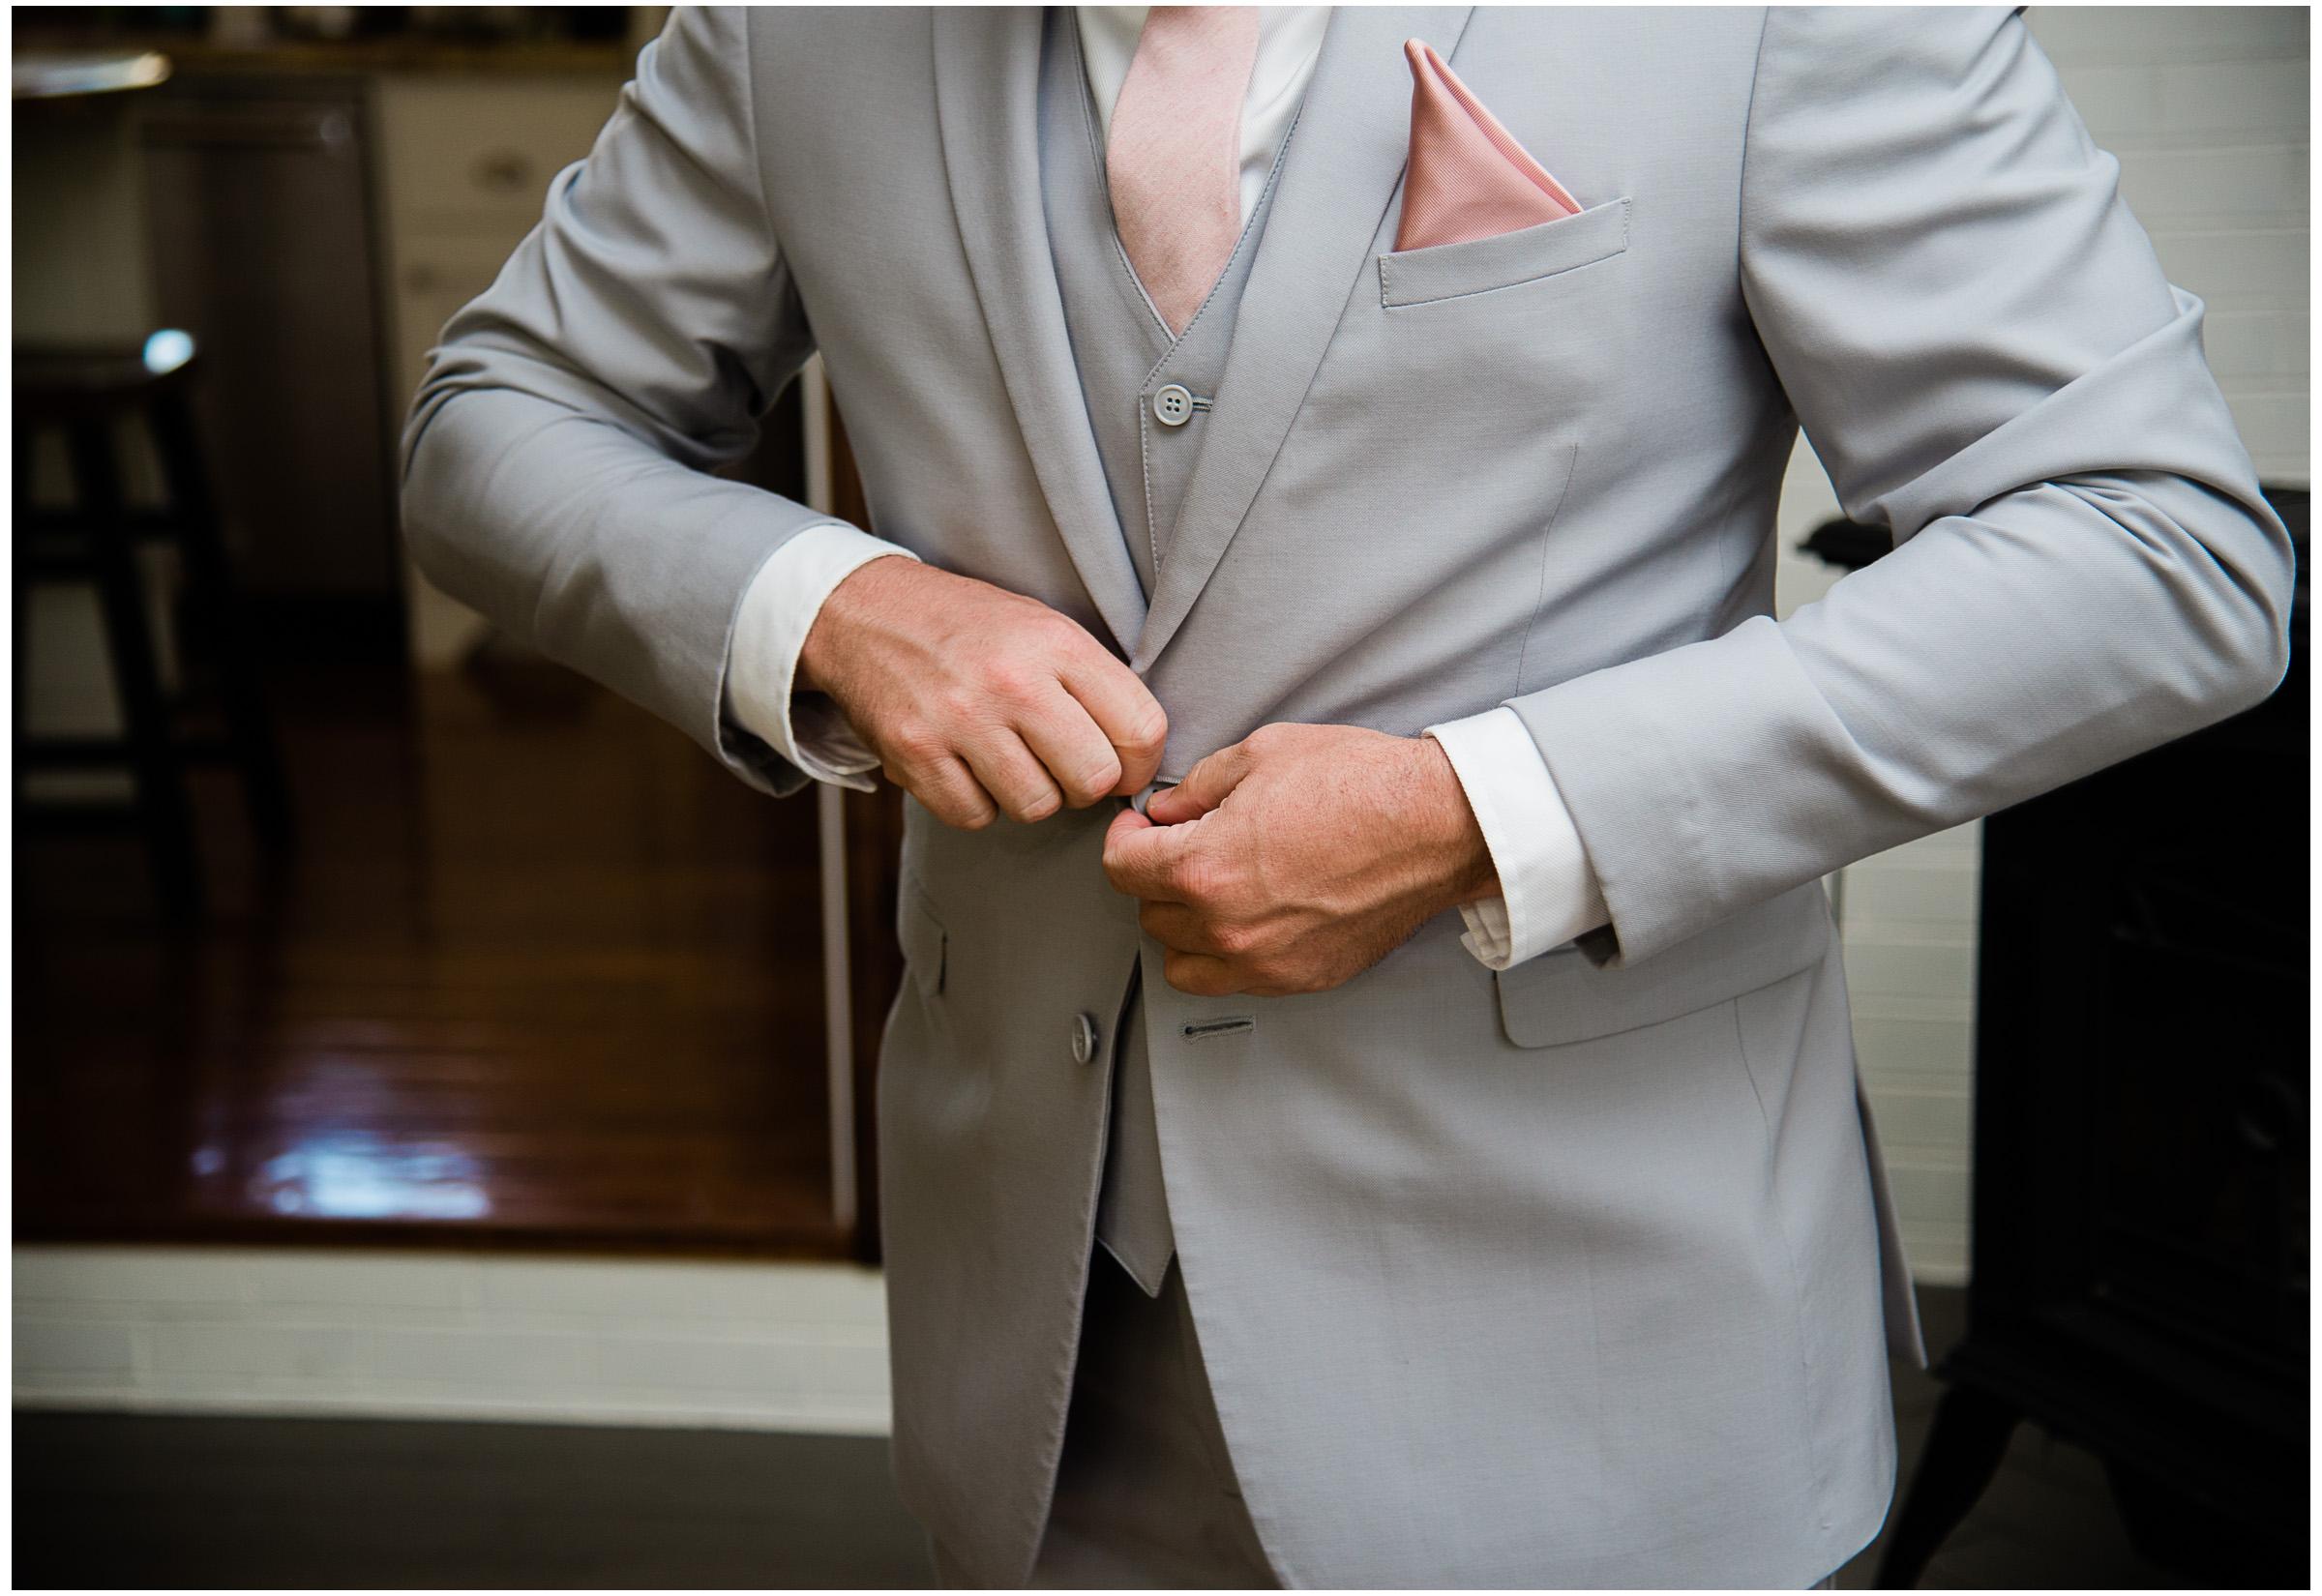 Placerville Wedding - Sacramento Photographer - Justin Wilcox Photography - 5.jpg